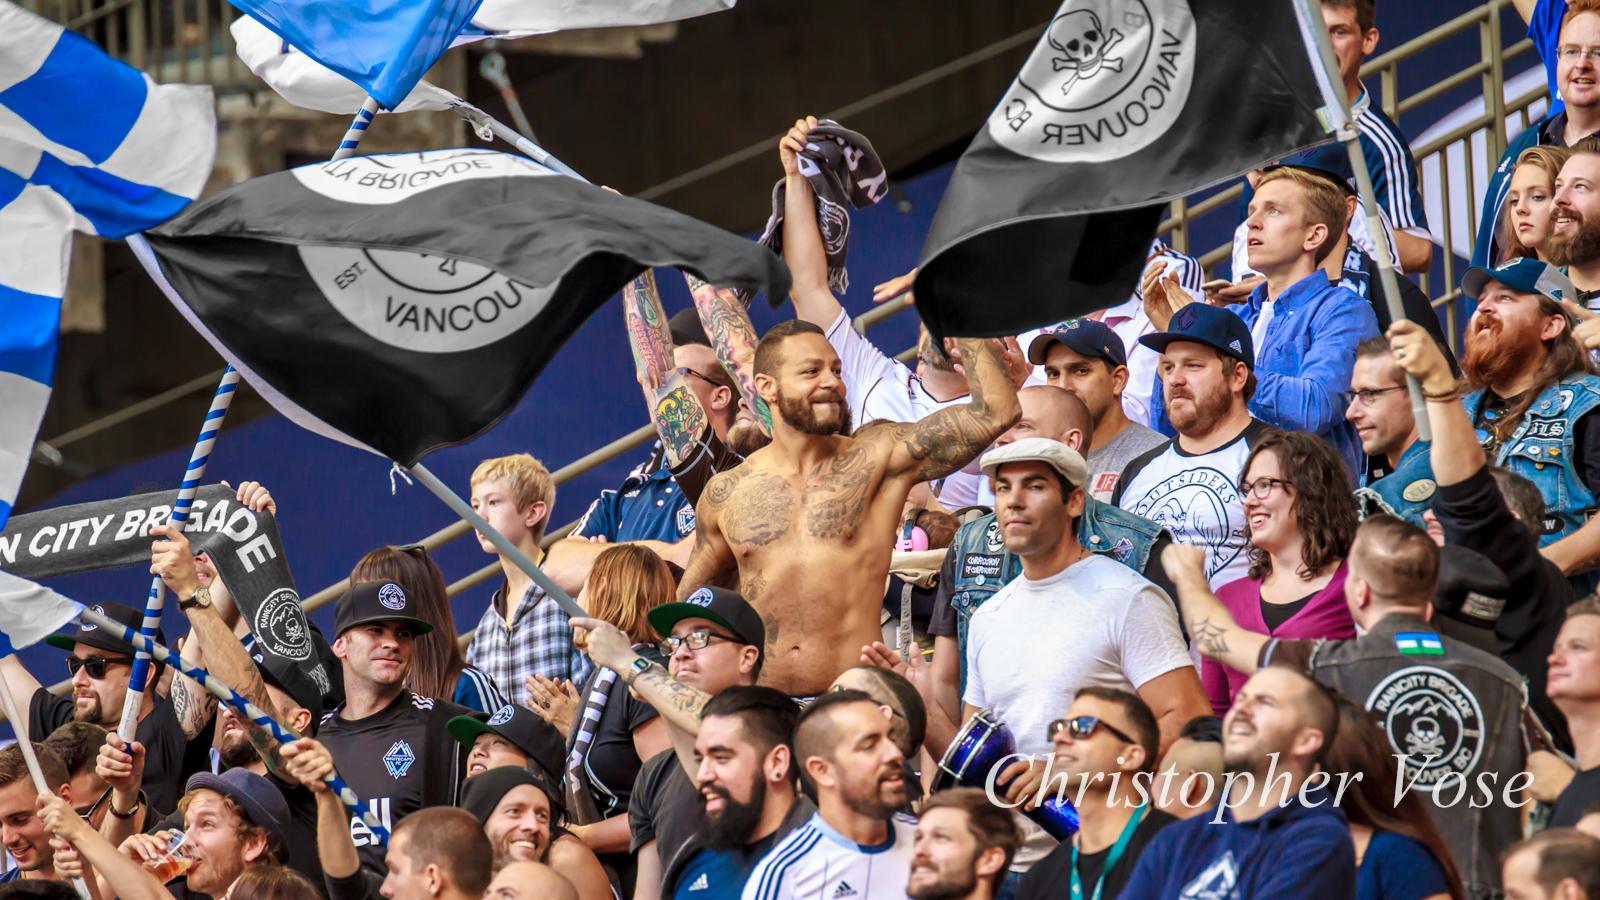 2015-07-26 Rain City Brigade Goal Reaction (Waston).jpg